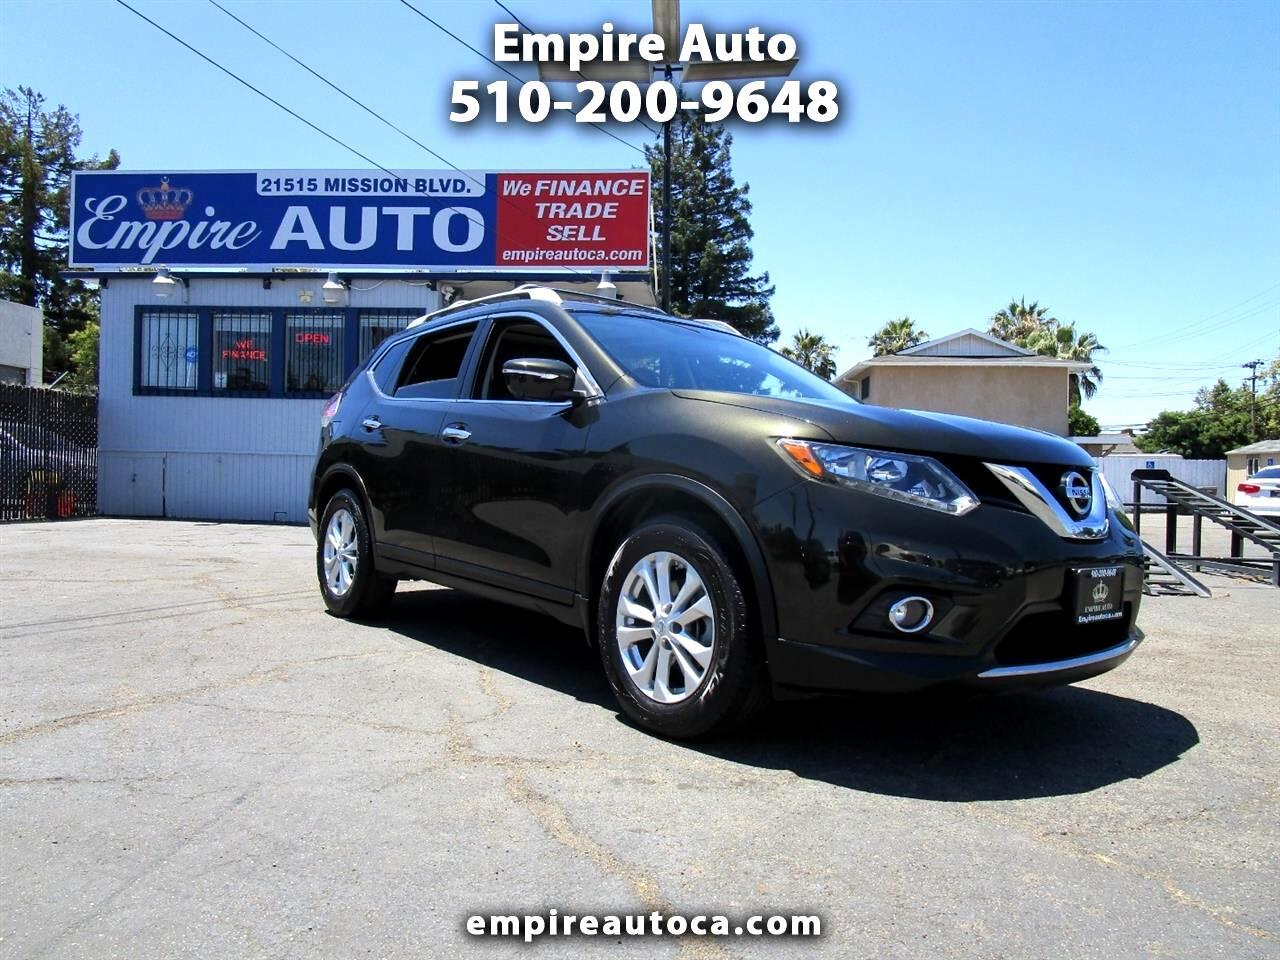 2015 Nissan Rogue Hayward CA